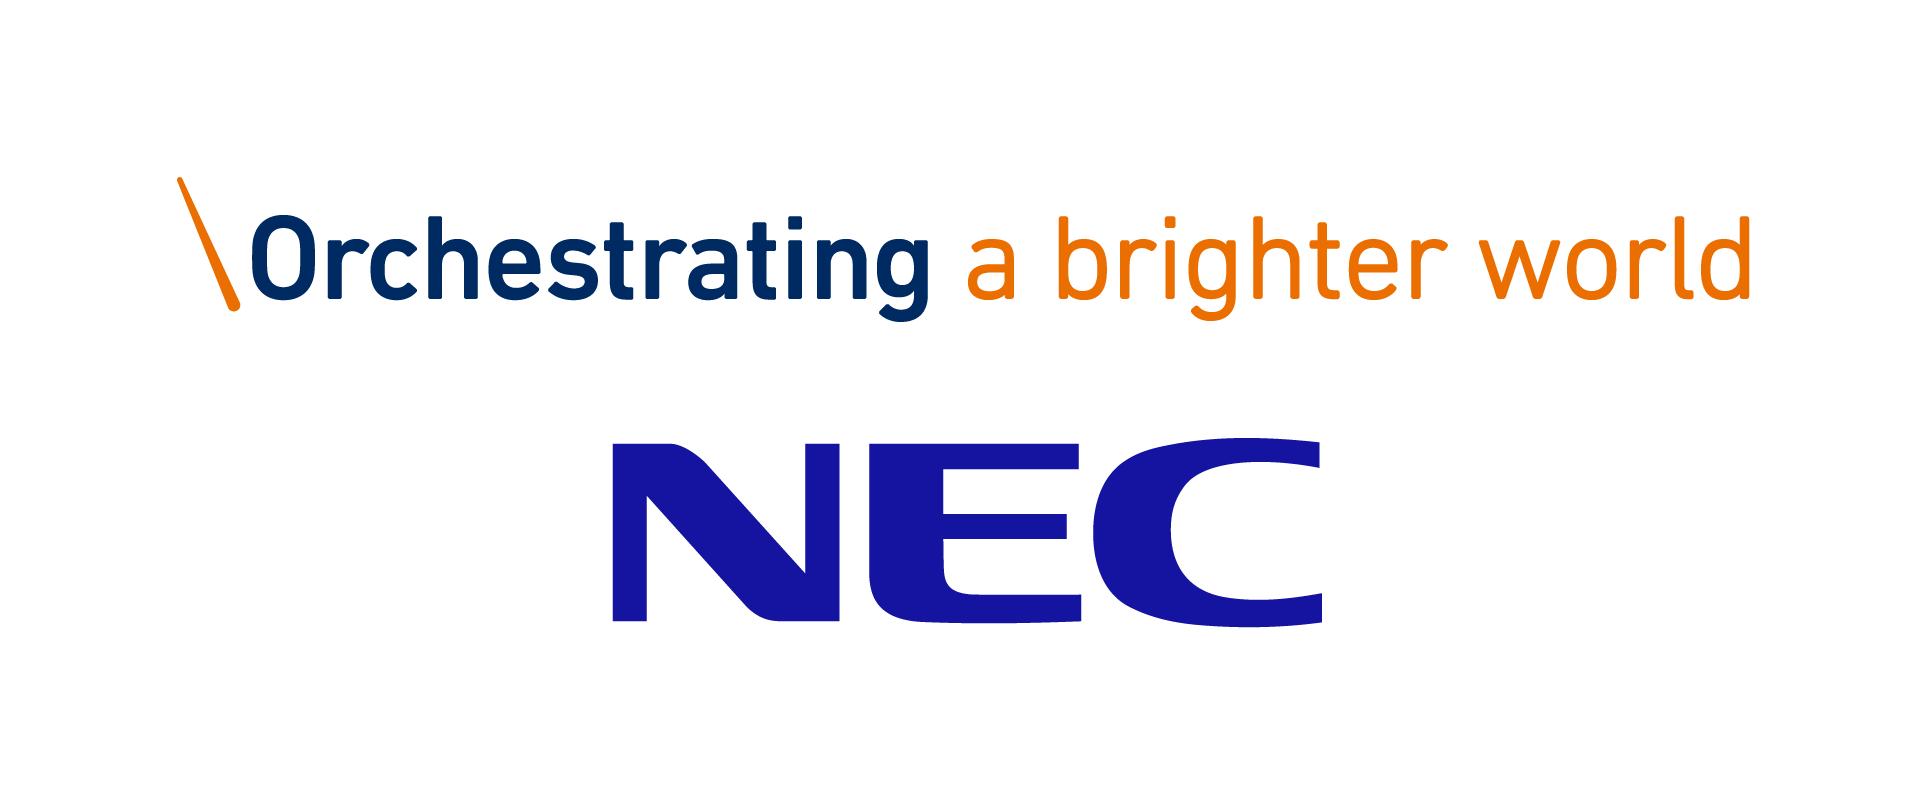 NEC (Statement)